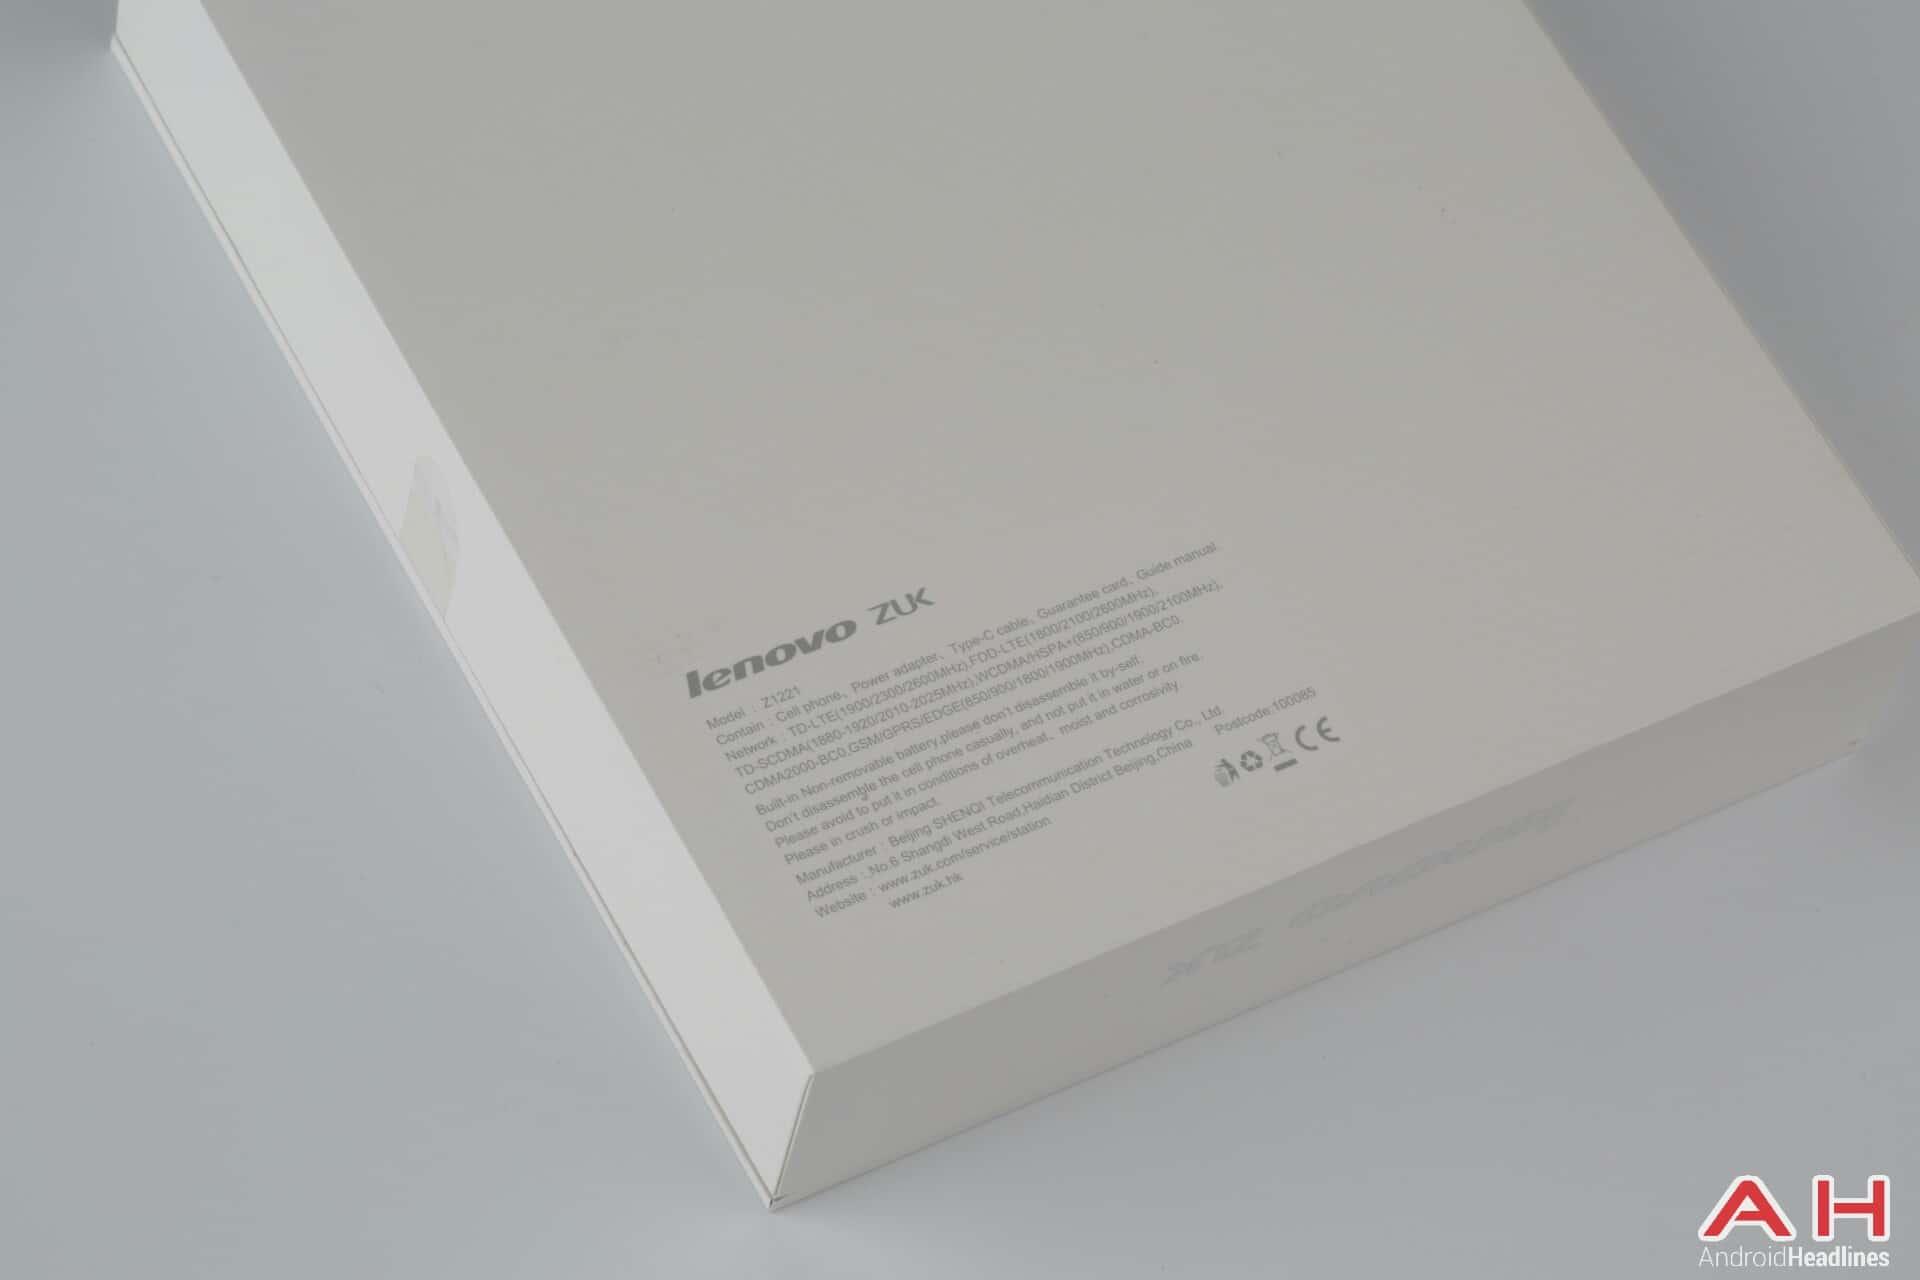 ZUK Z1 international version 4